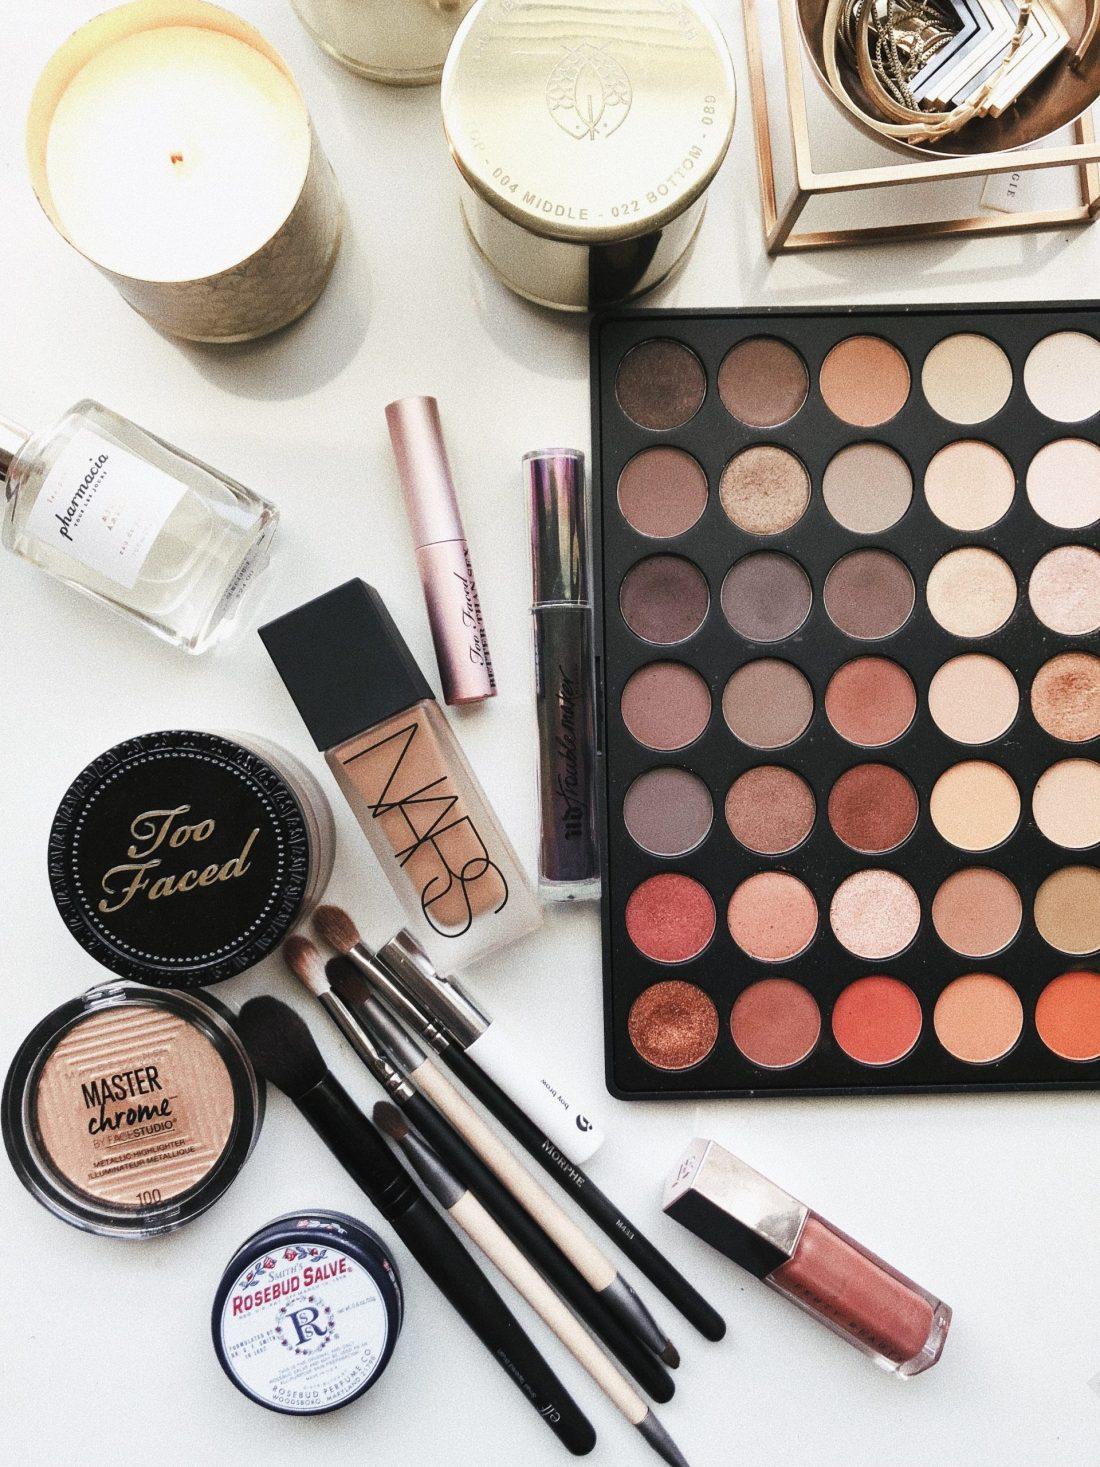 What's On My Wishlist in October 2018 | Makeup Wishlist ⋆ Beautymone